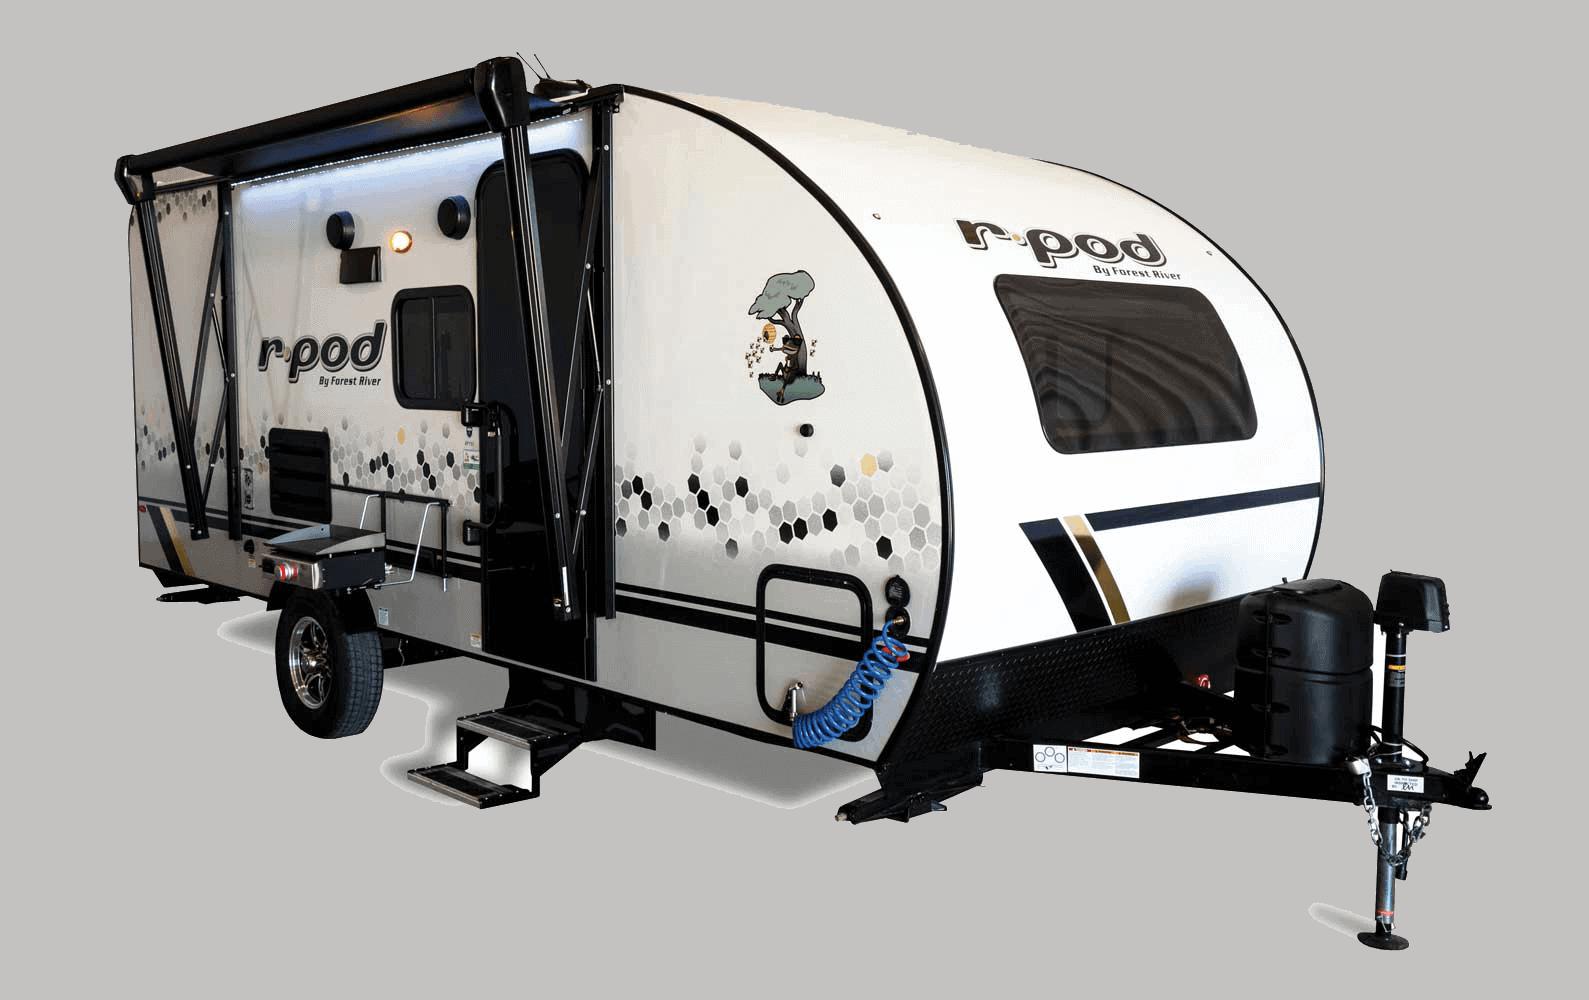 R-Pod Travel Trailer